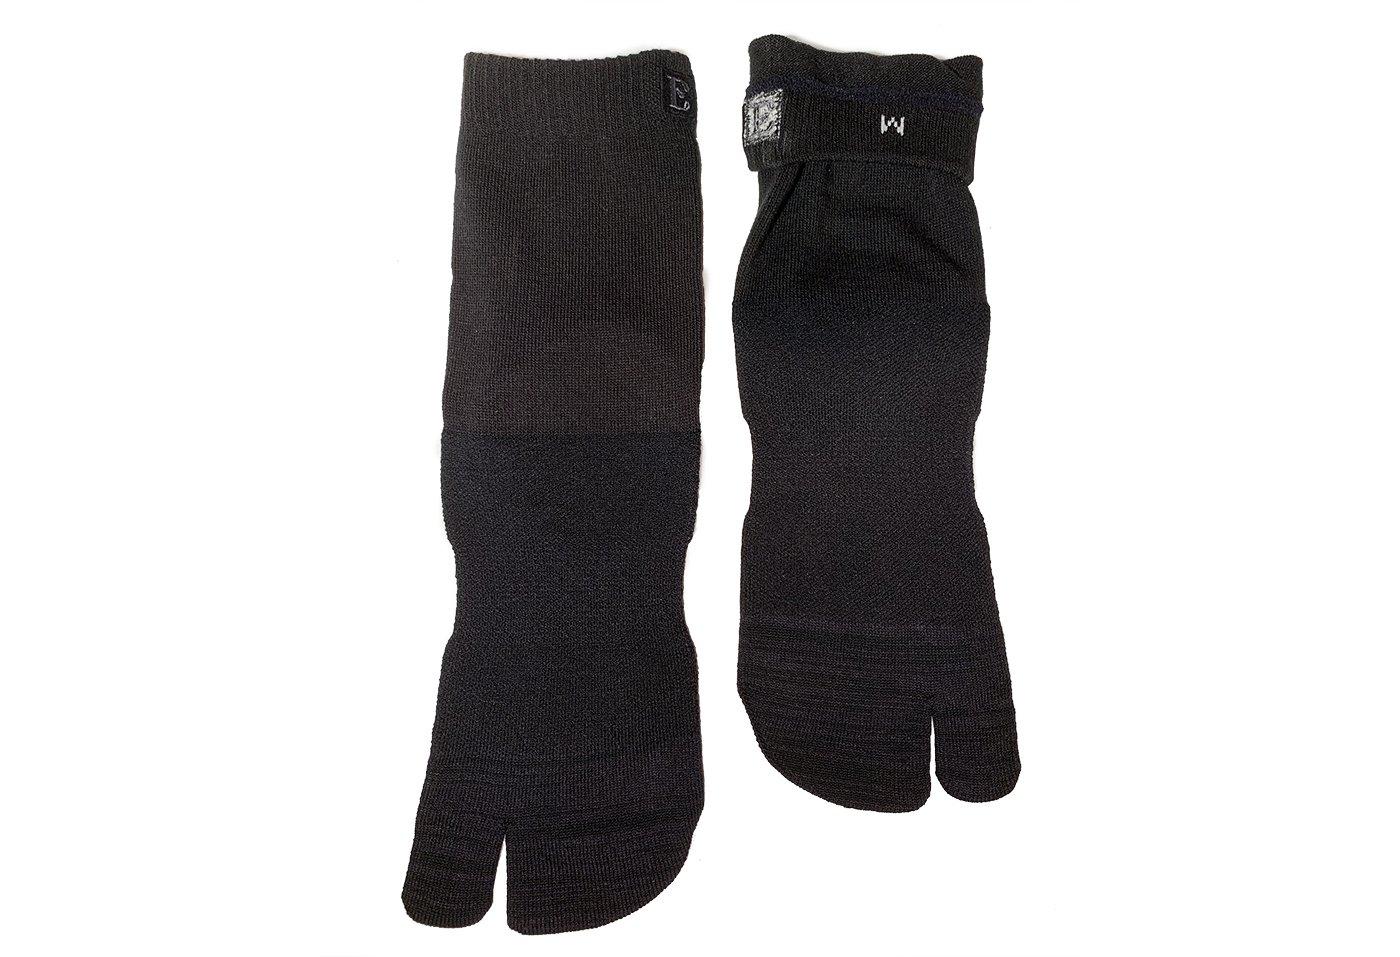 Crew Wool Tabi Socks - Black Picture 7